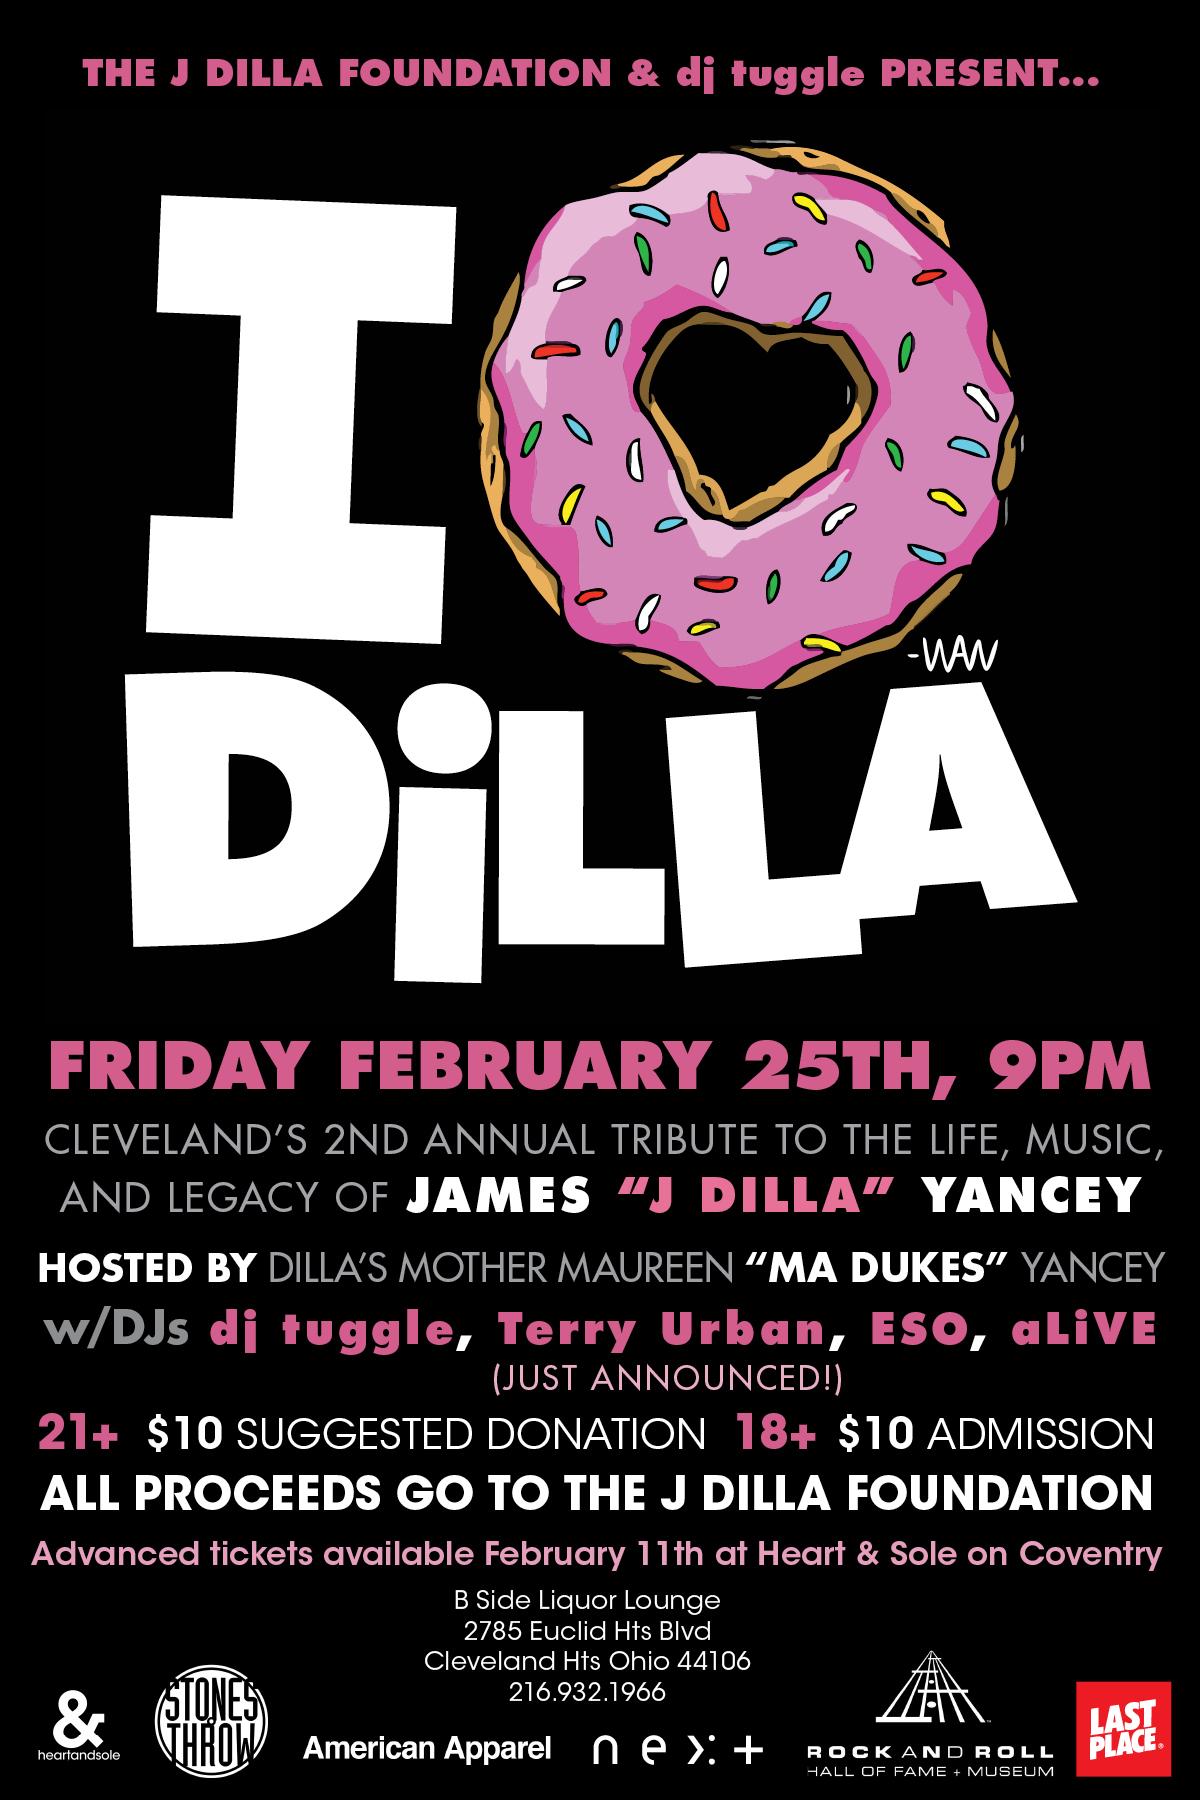 2nd Annual J Dilla Tribute & Fundraiser